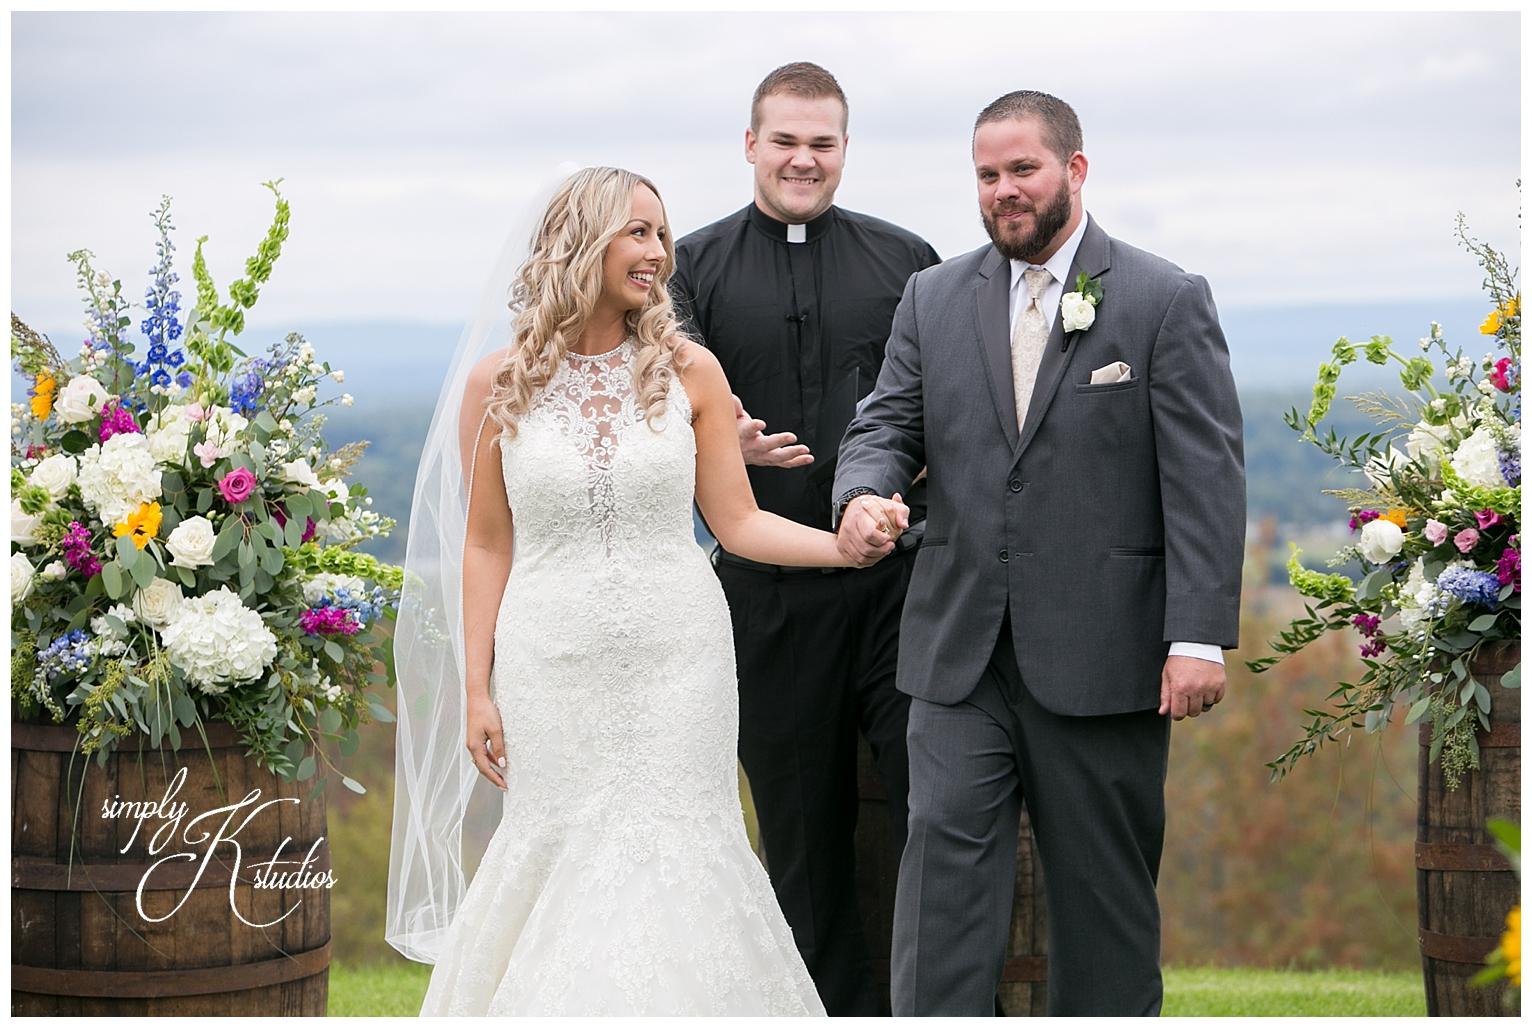 Destination Wedding Photographer in Colorado.jpg